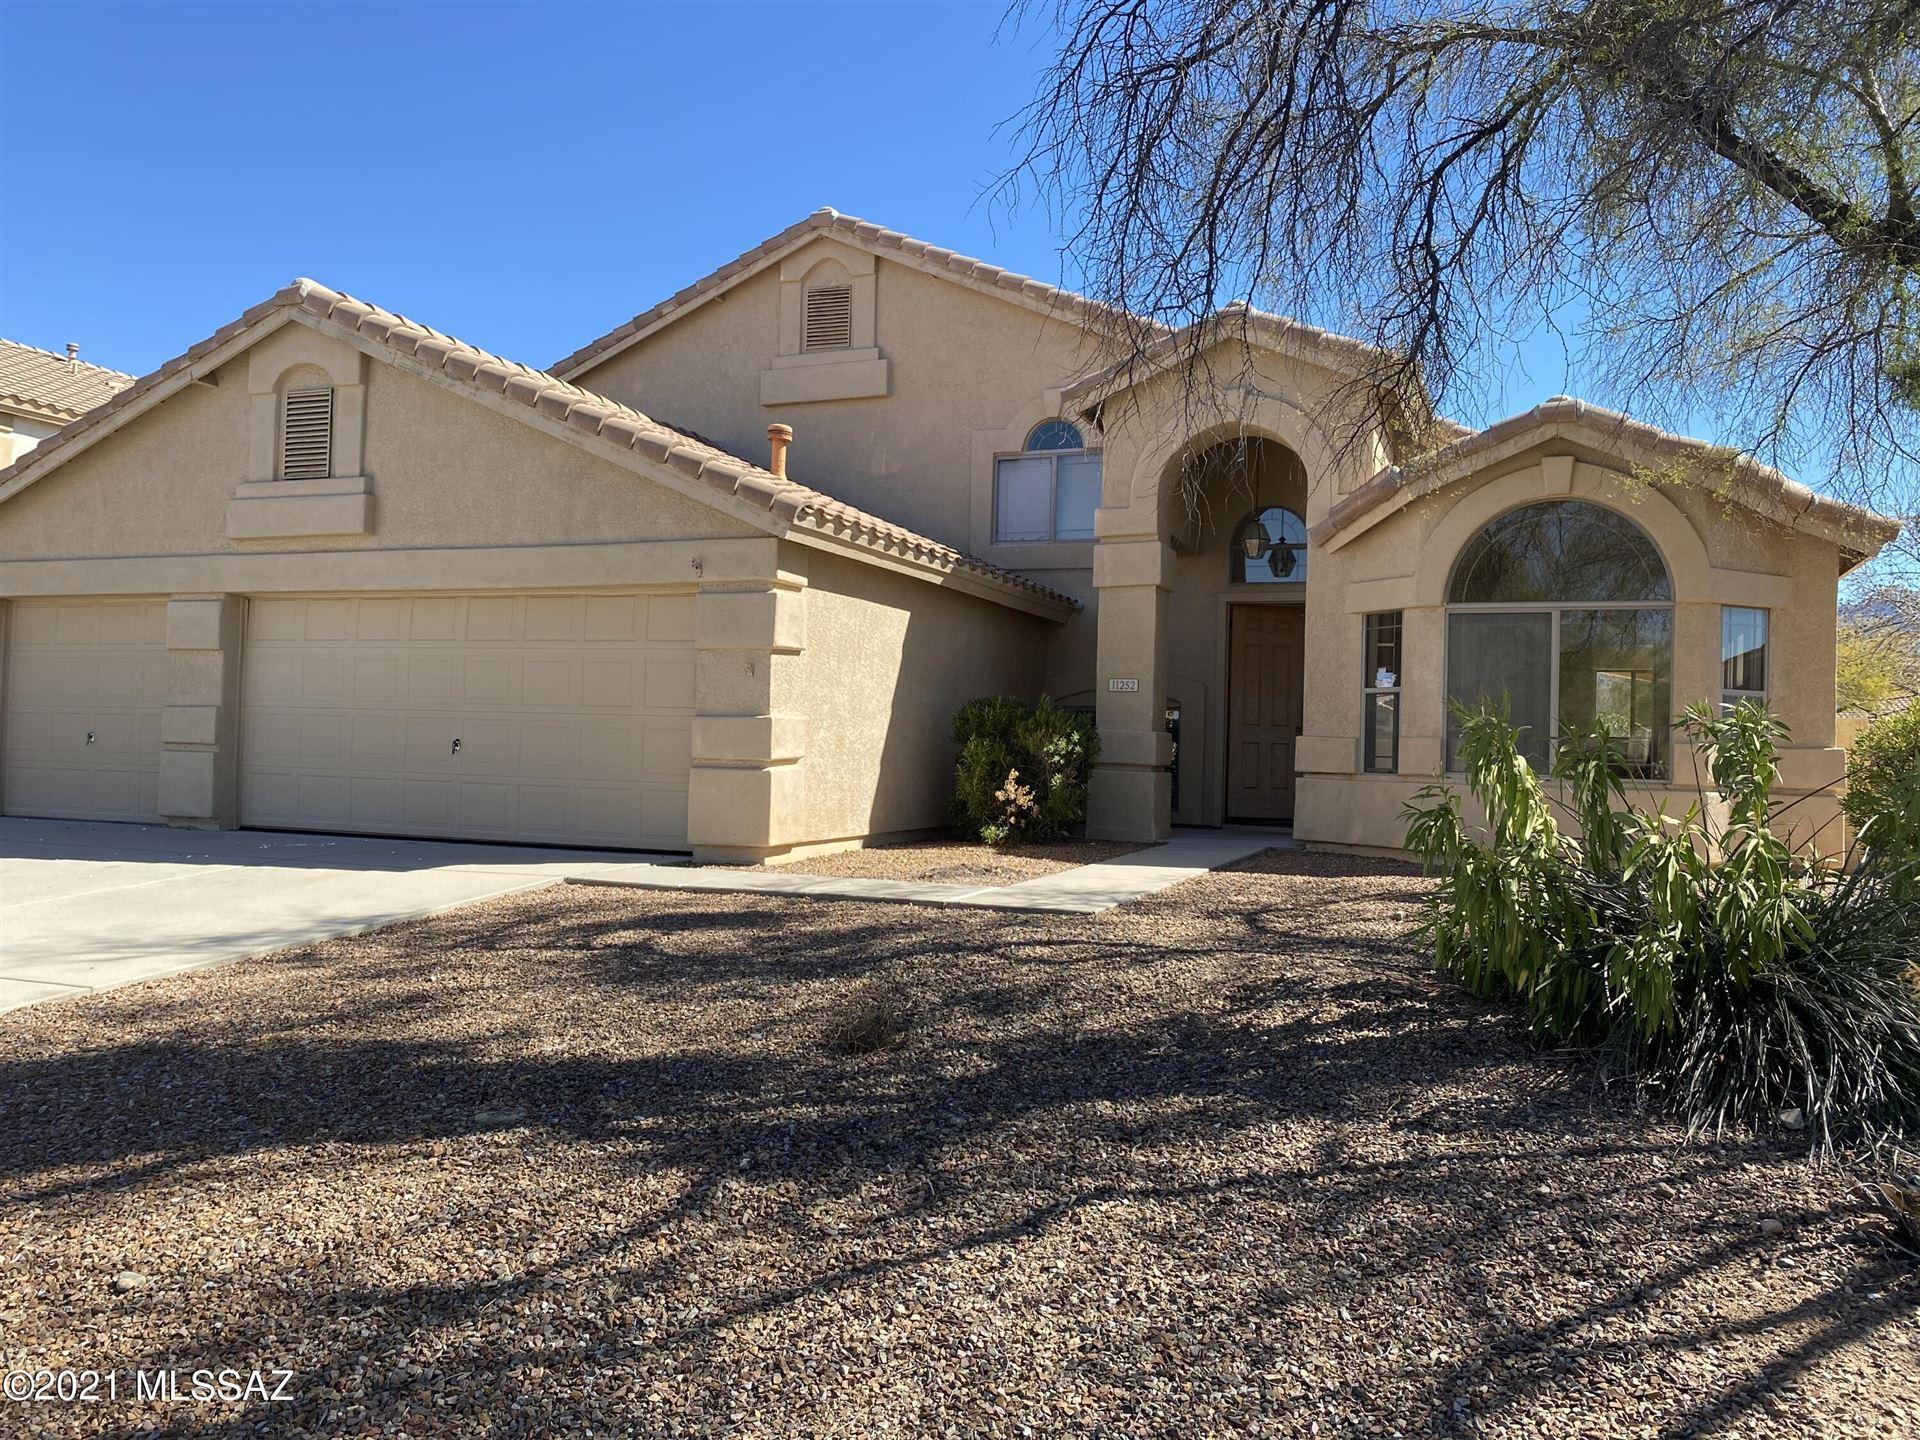 11252 N Twin Spur Court, Tucson, AZ 85737 - MLS#: 22104548